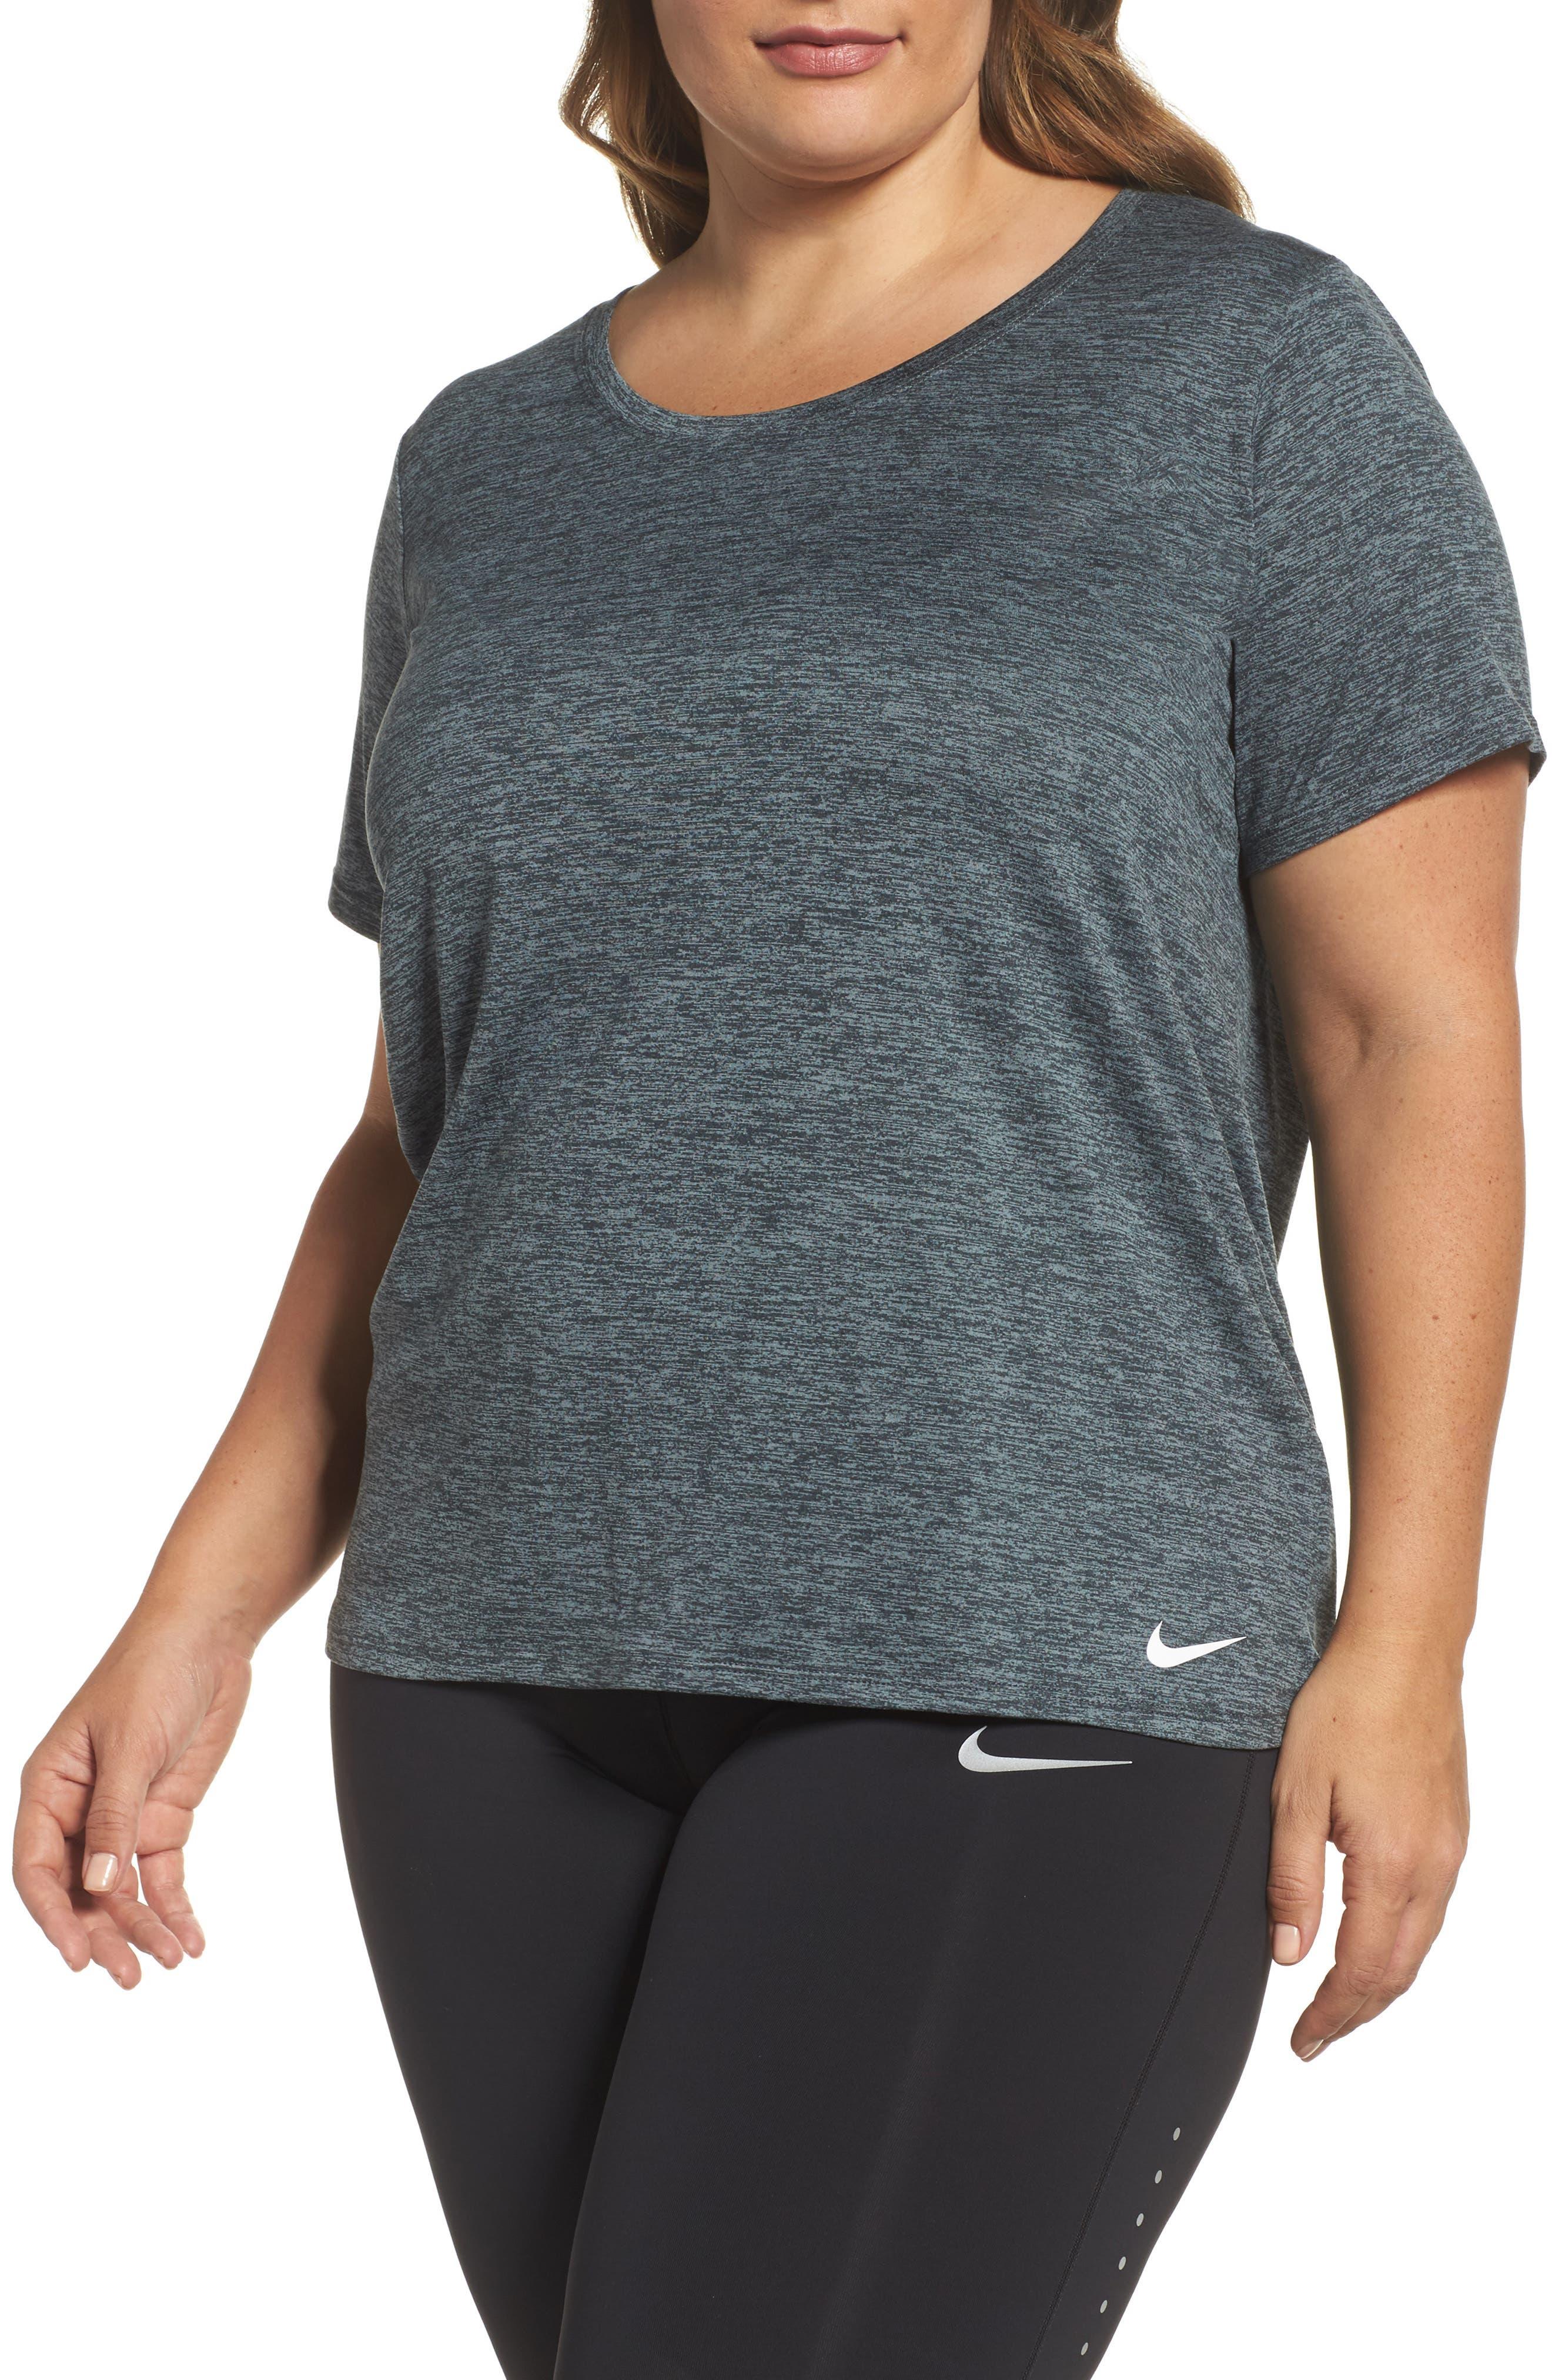 Nike Dry Legend Training Tee (Plus Size)